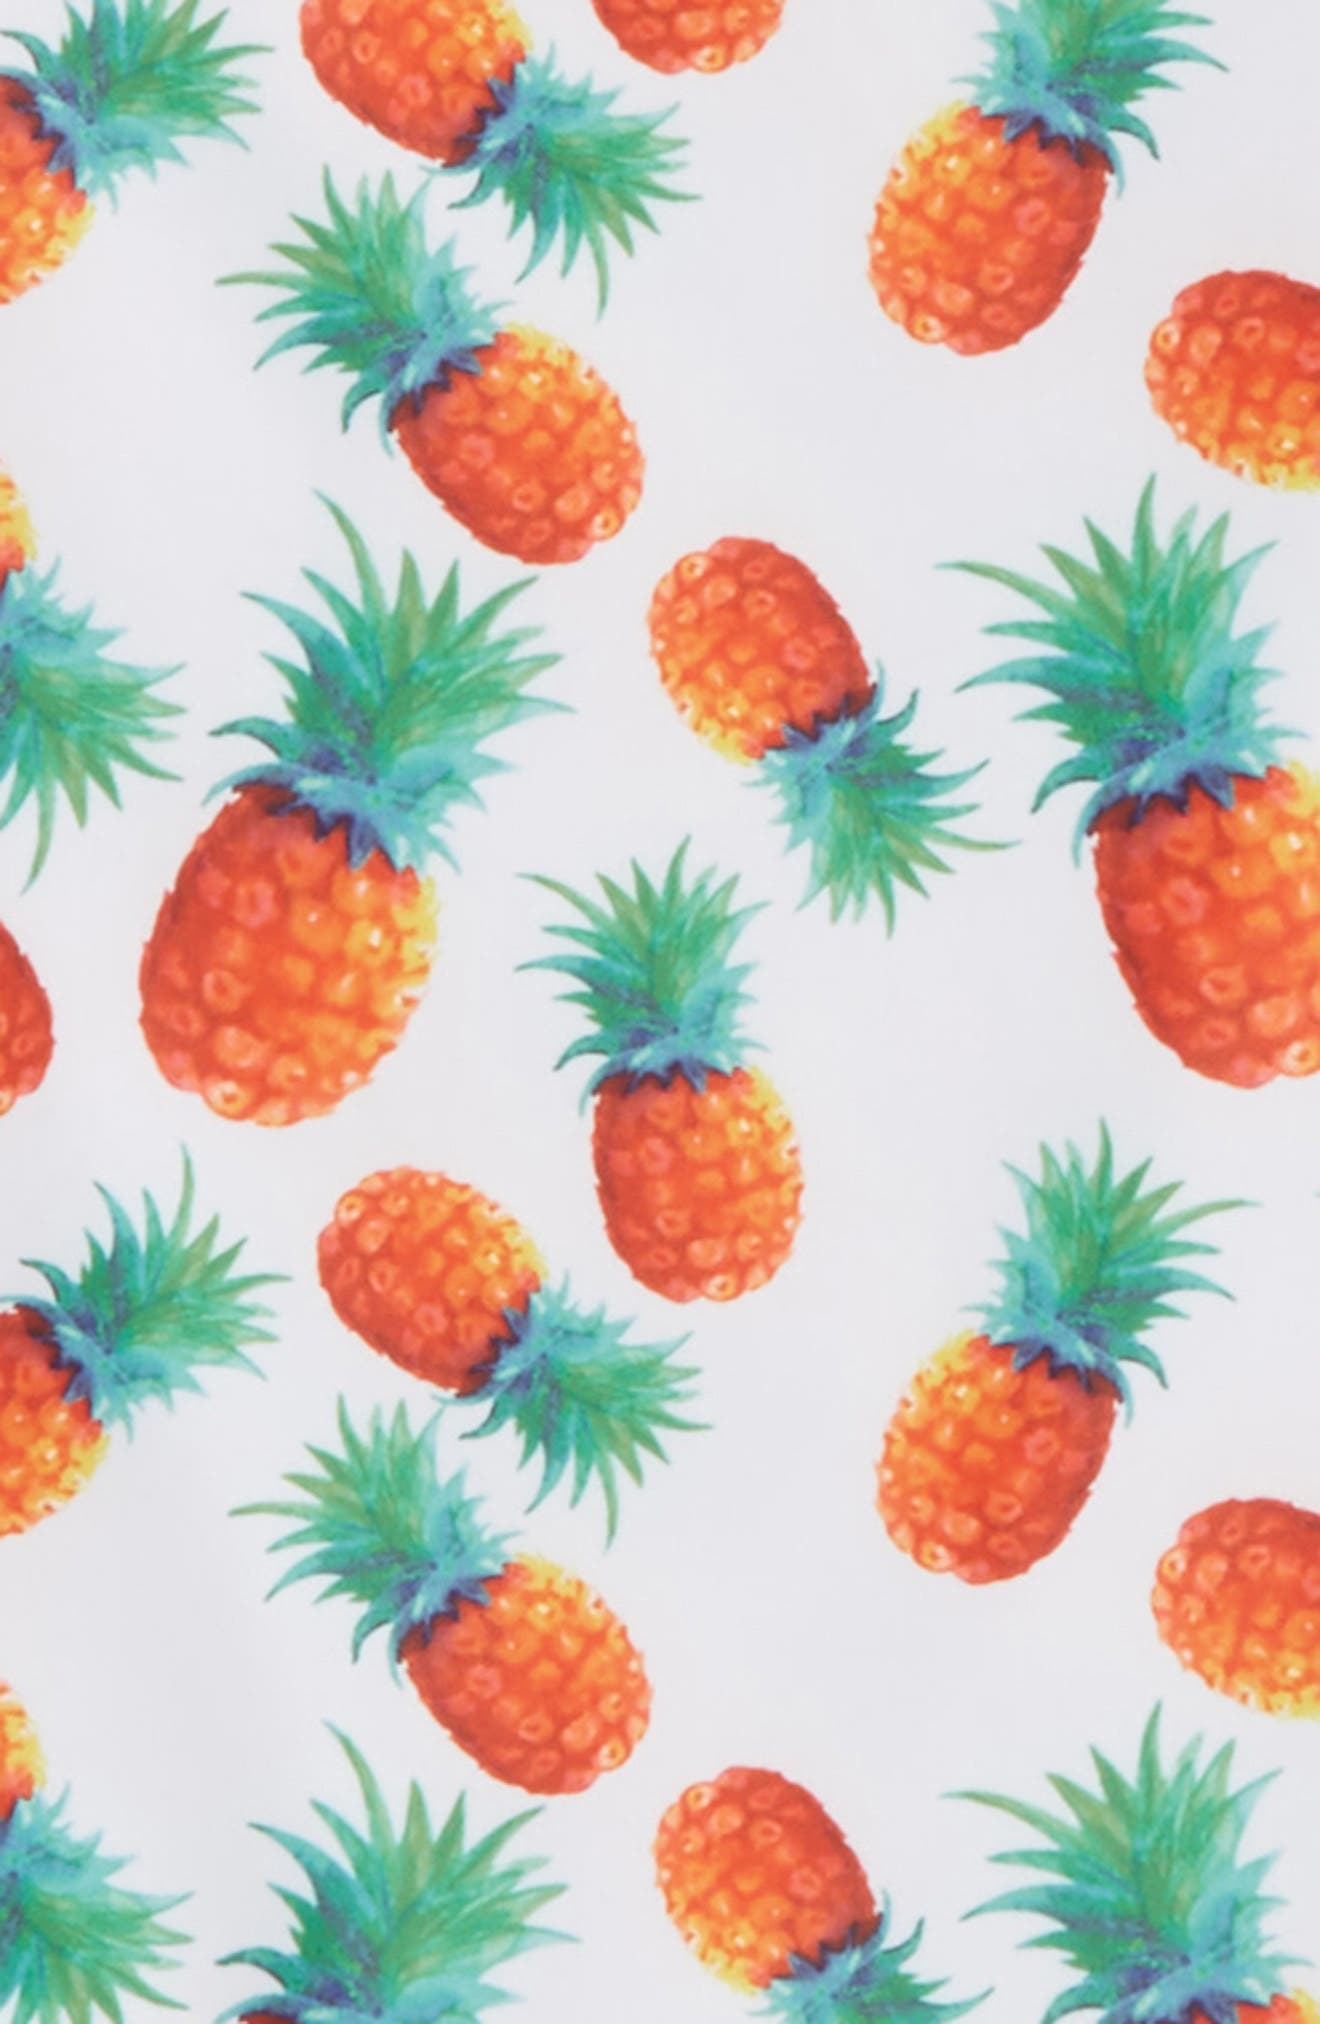 Pineapple Disco Two-Piece Rashguard Swimsuit,                             Alternate thumbnail 2, color,